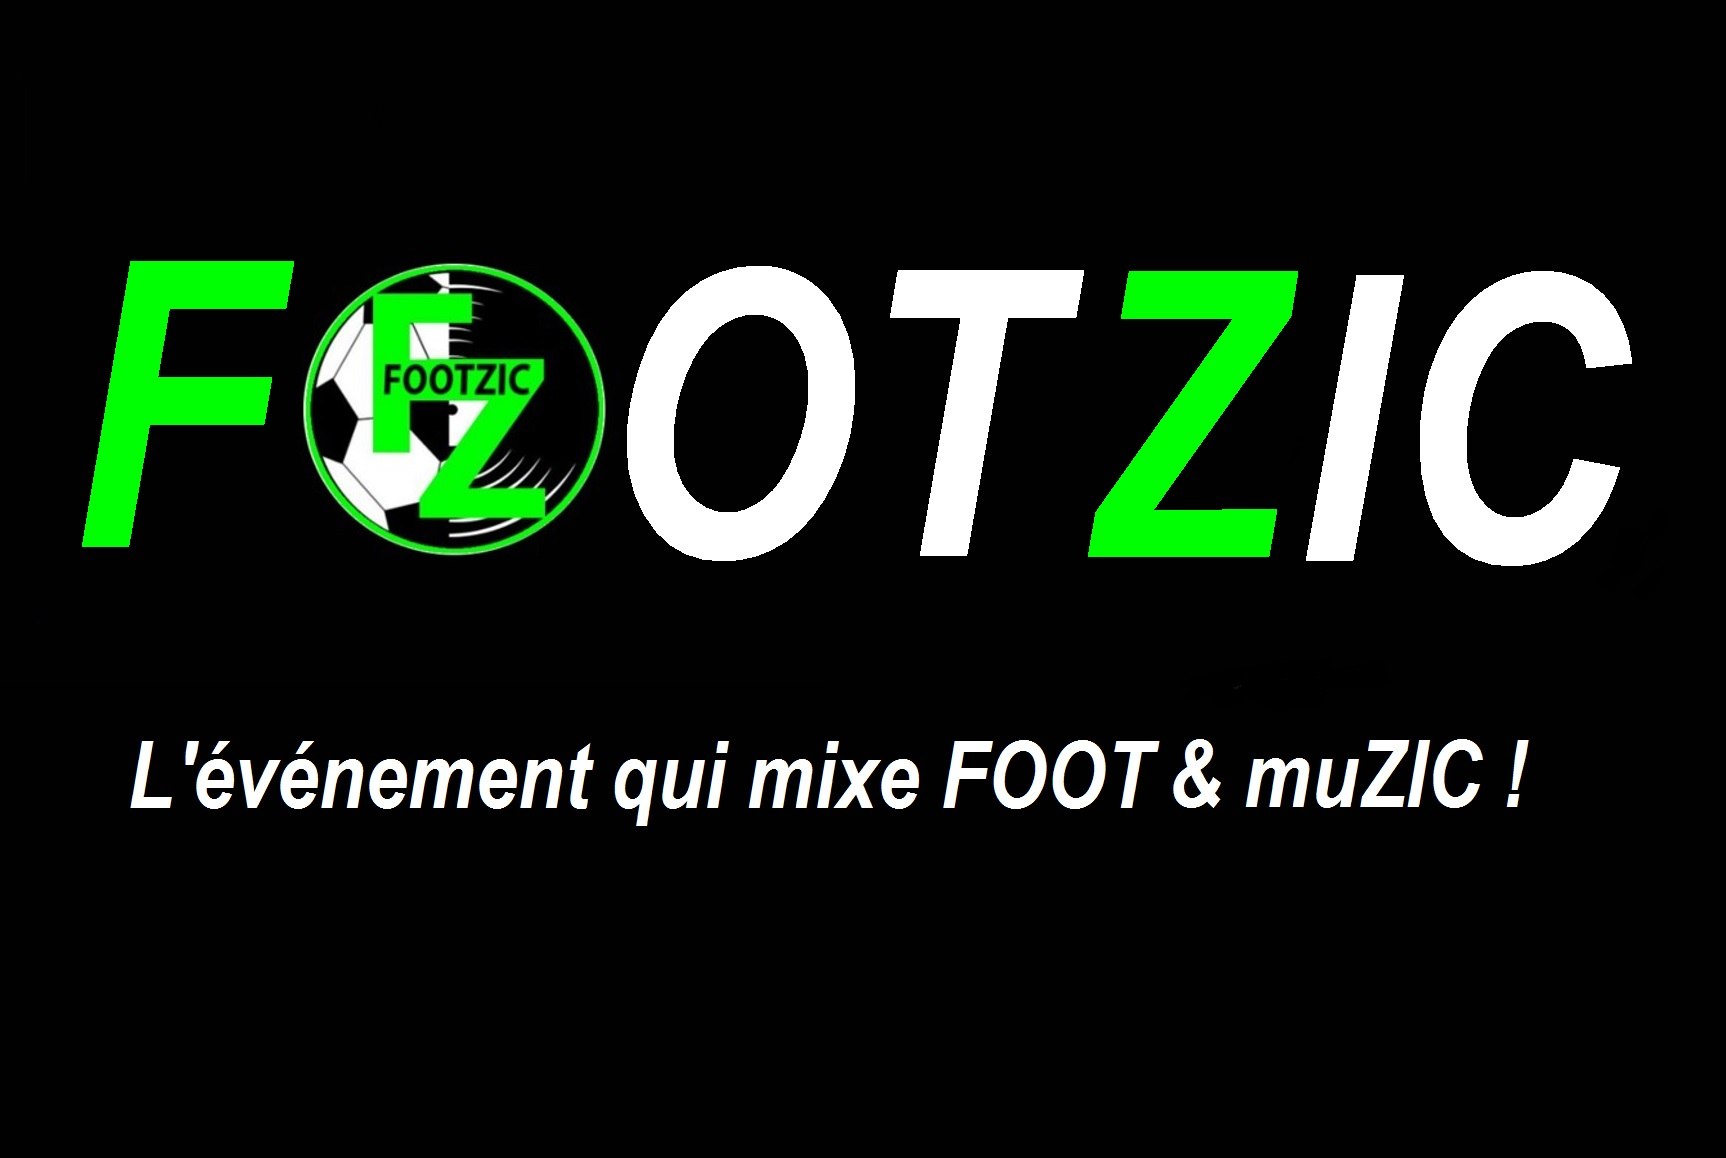 Footzic